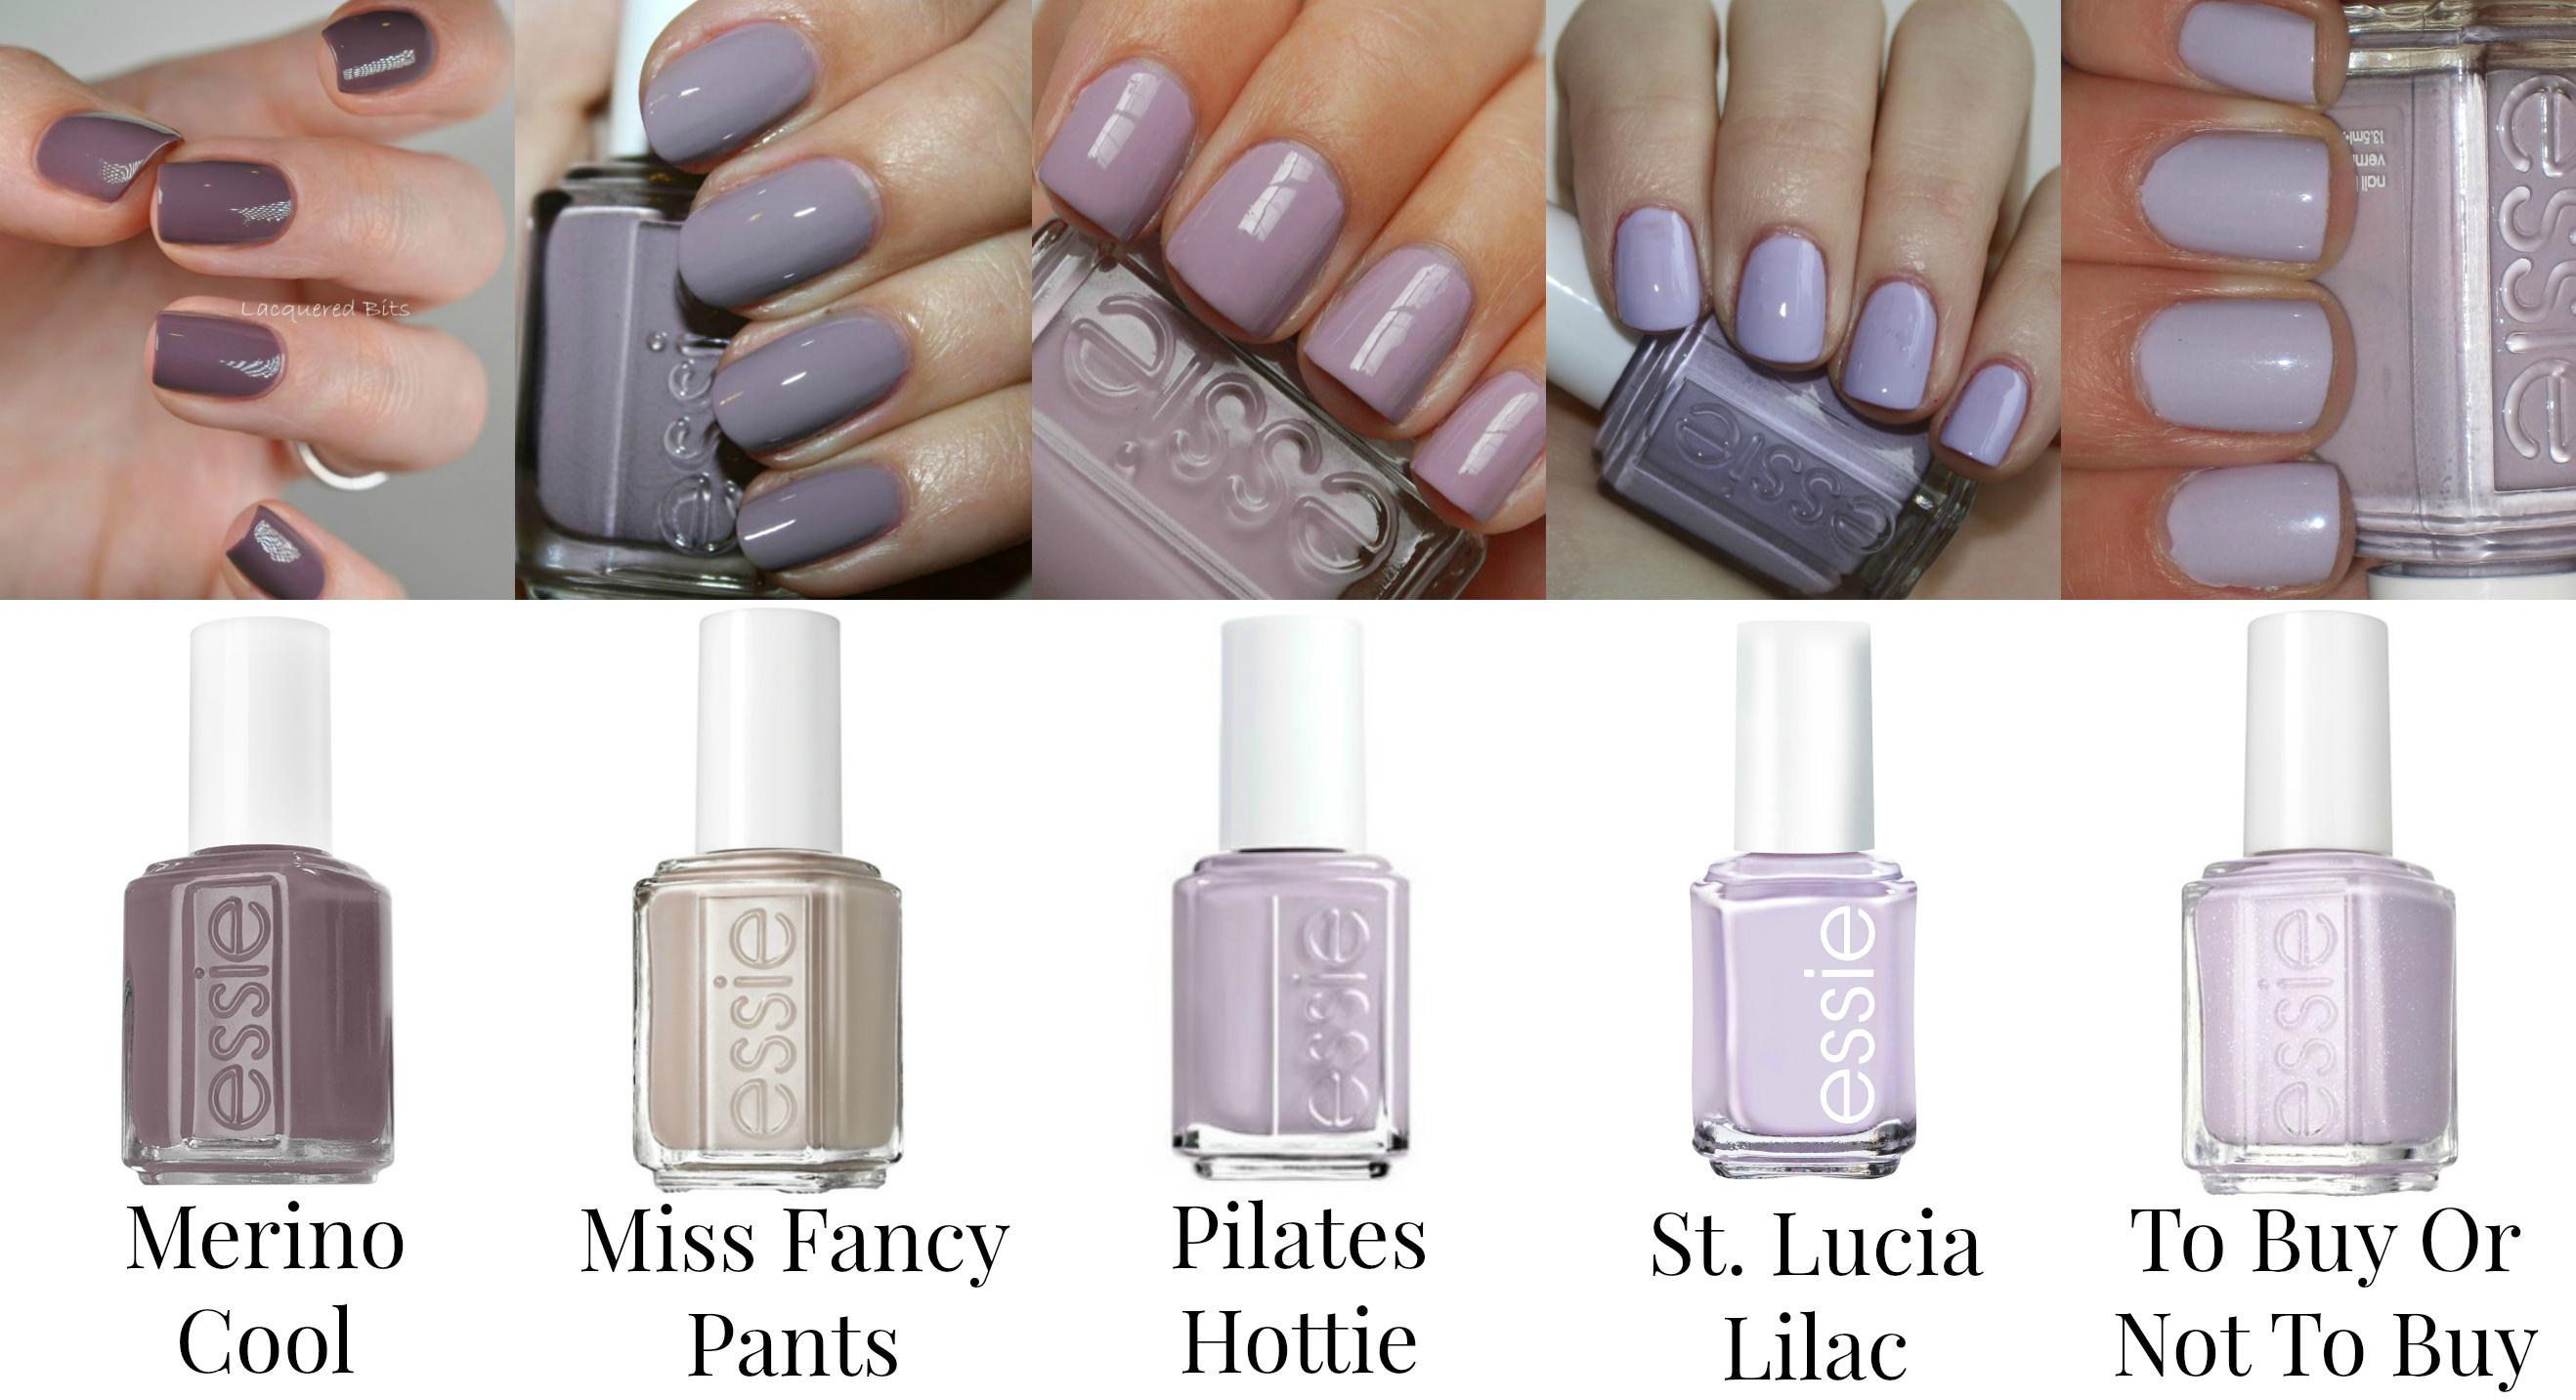 Essie Nail Polishes - Purples - Merino Cool, Miss Fancy Pants ...